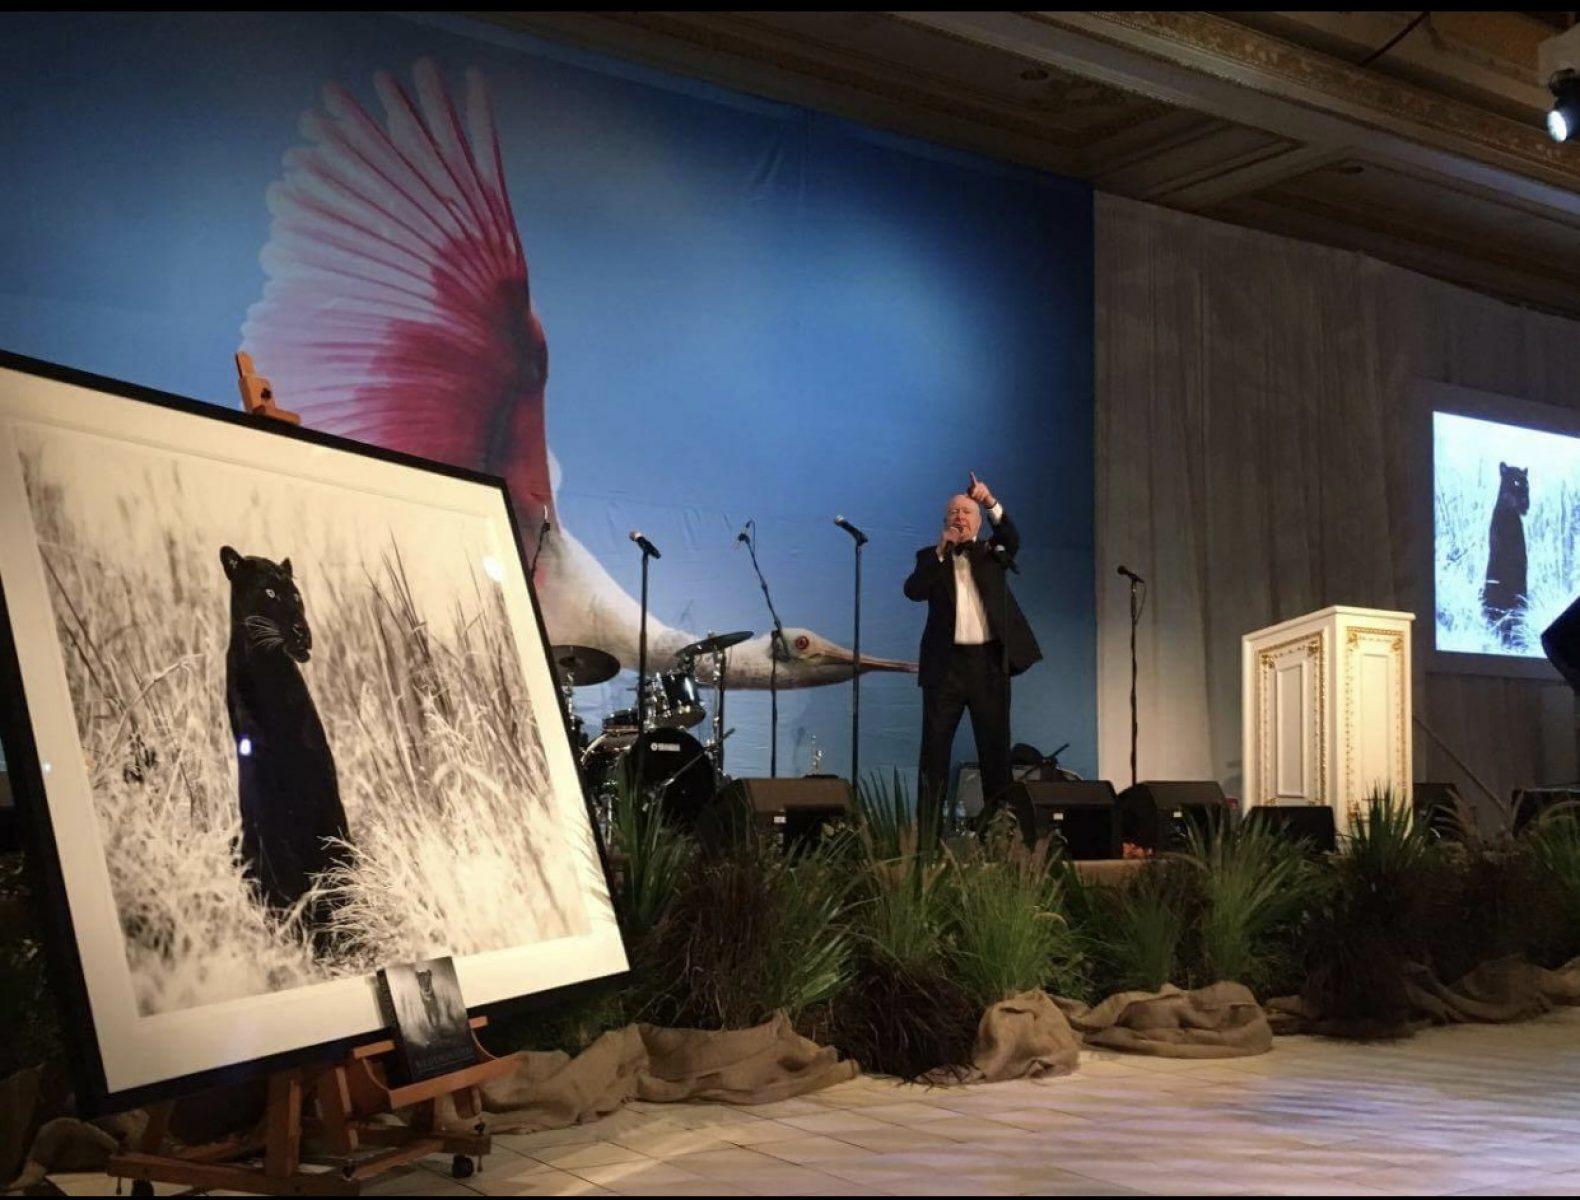 Bagheera Raises $33,000 At The Palm Beach Conservation Gala